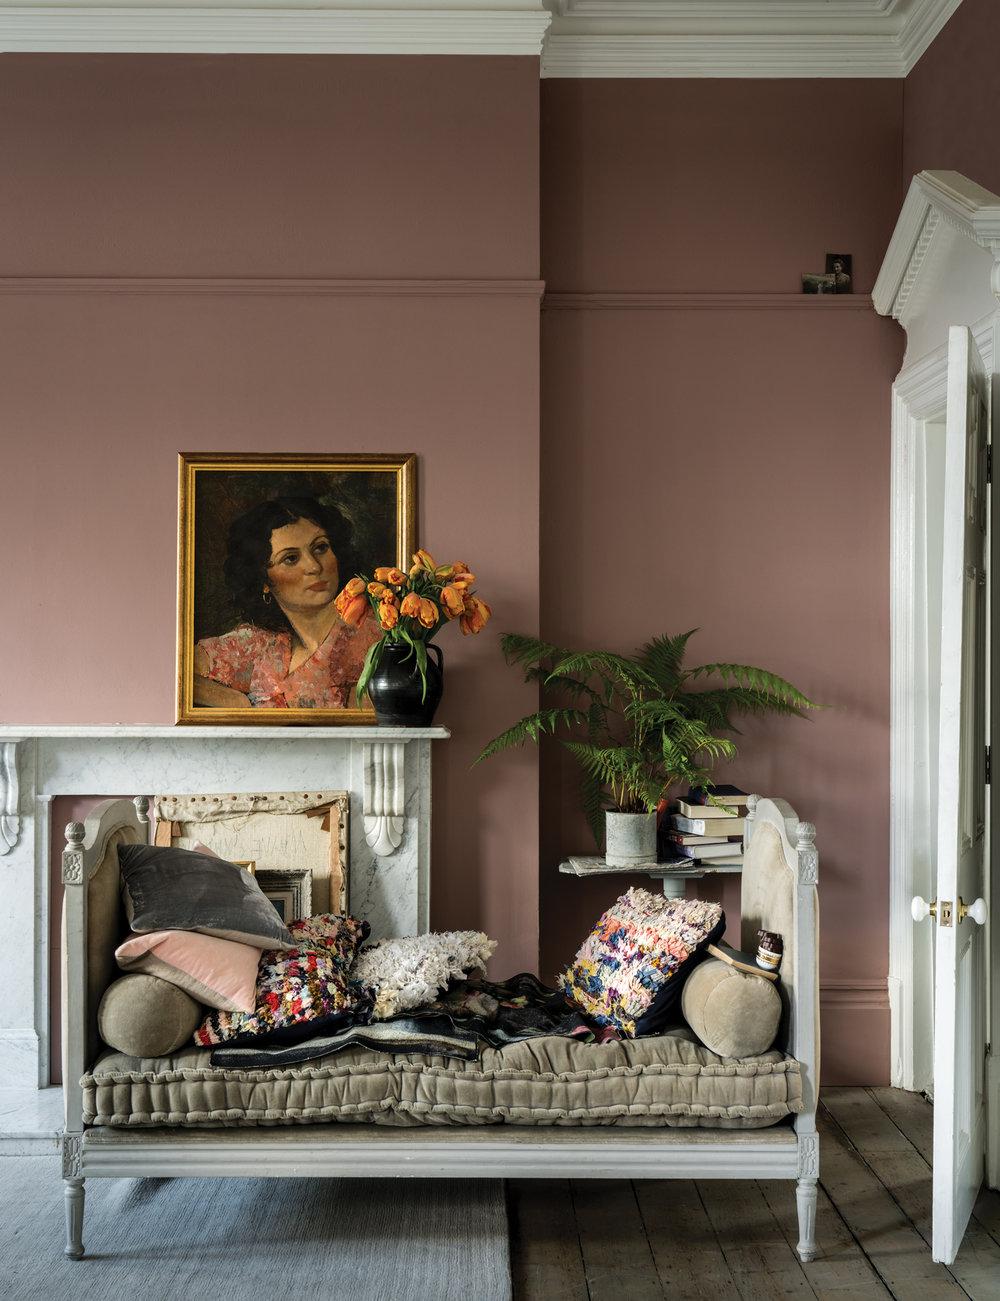 Sulking-Room-Pink-No-2.jpg